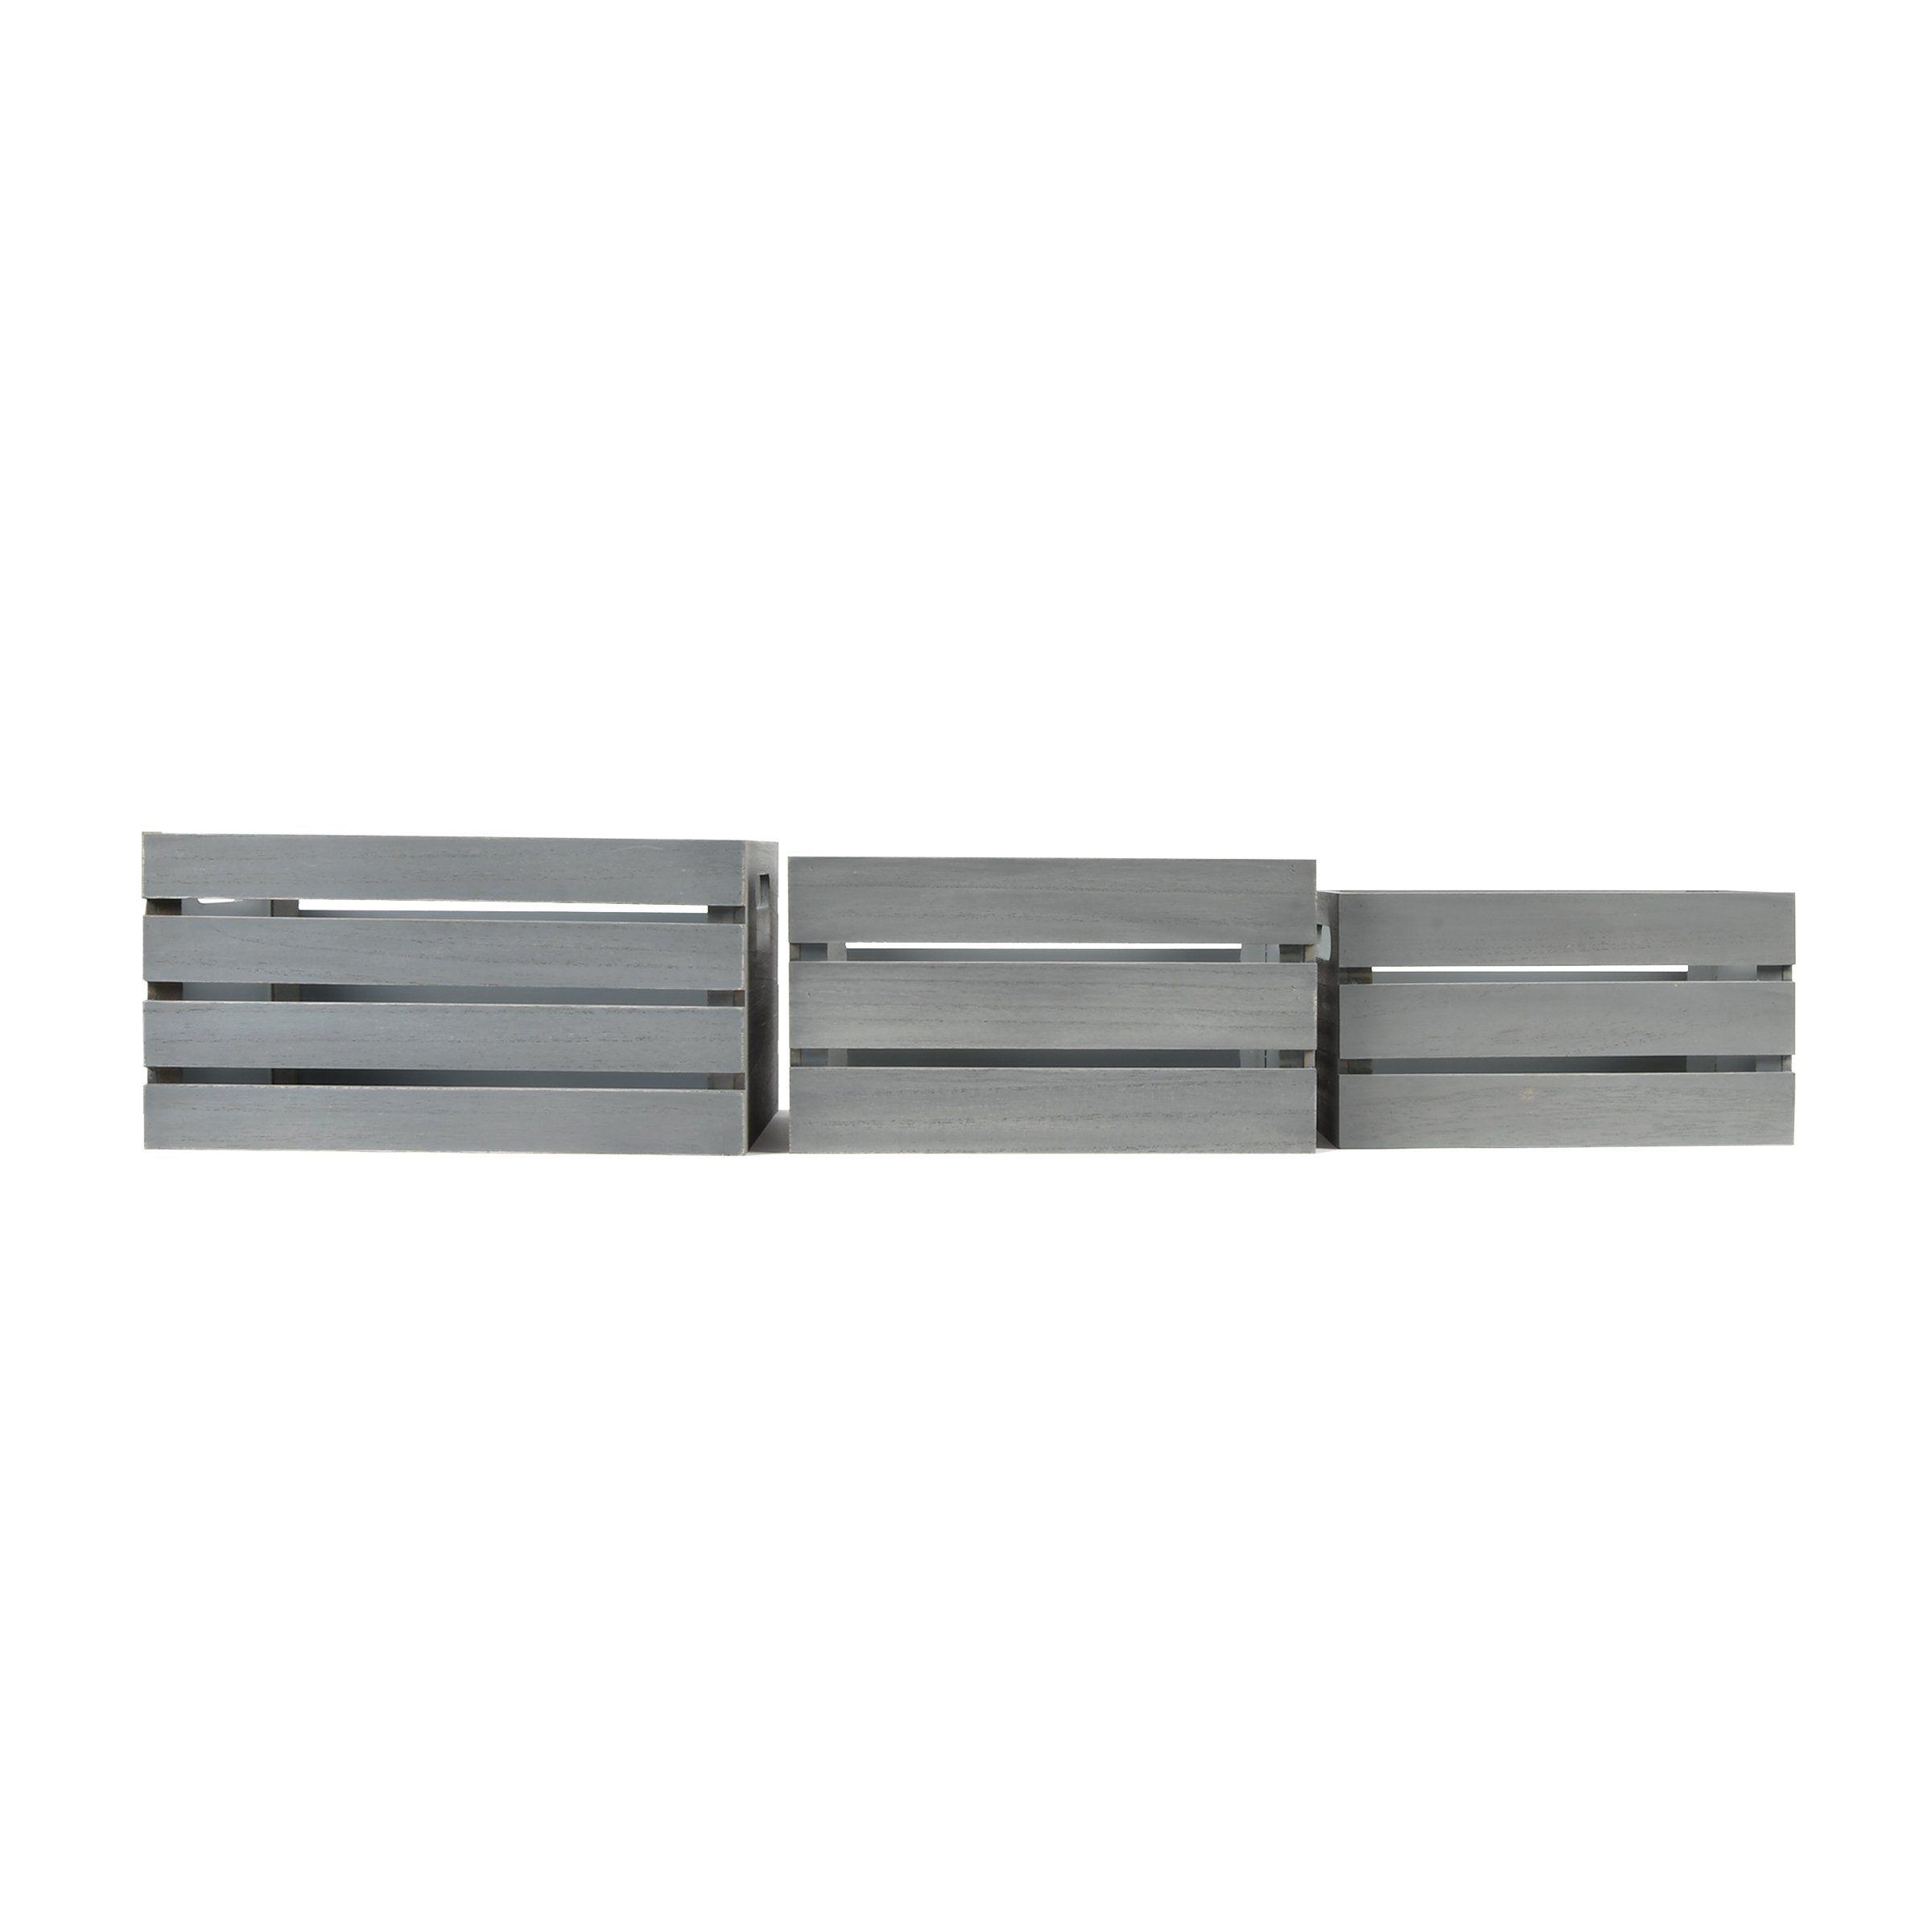 Photo of Distressed Grey 13.4'W x 9.5'H Nesting Storage Crates, Set of Three